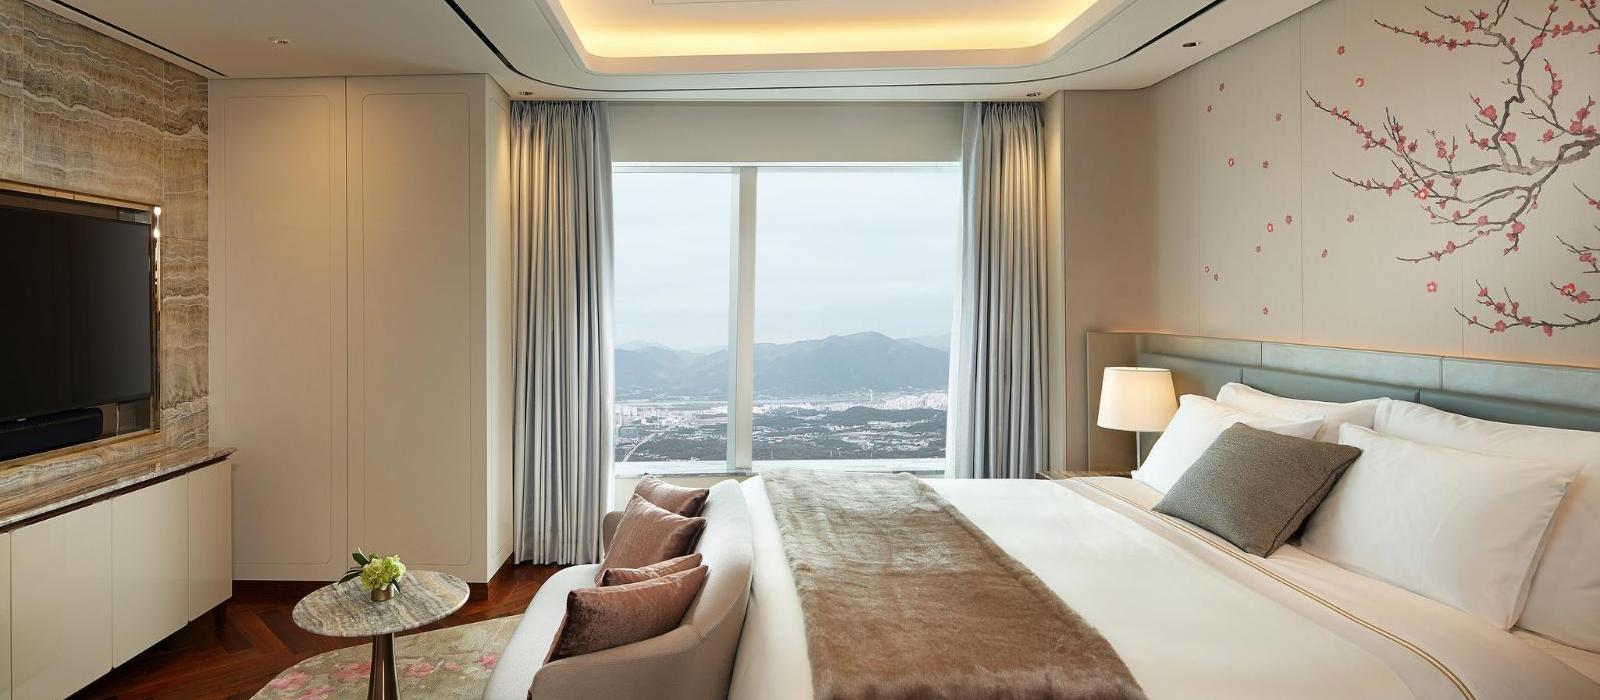 首尔喜格尼尔酒店(Signiel Seoul) 图片  www.lhw.cn